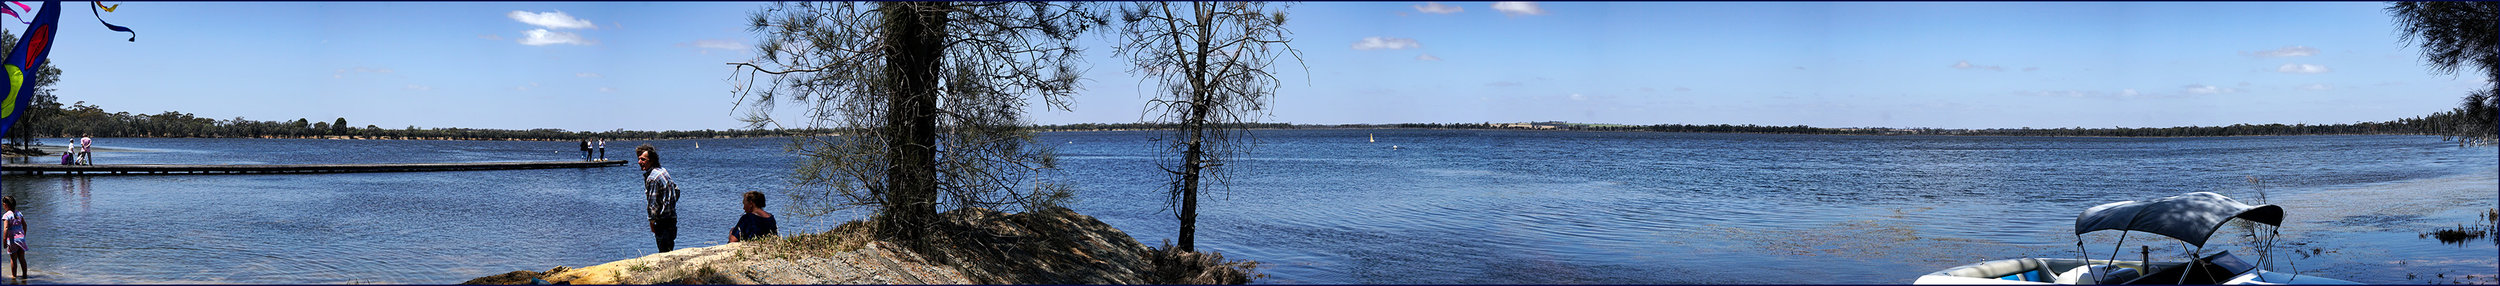 LakeYearleringPano01-3500x-c10.jpg